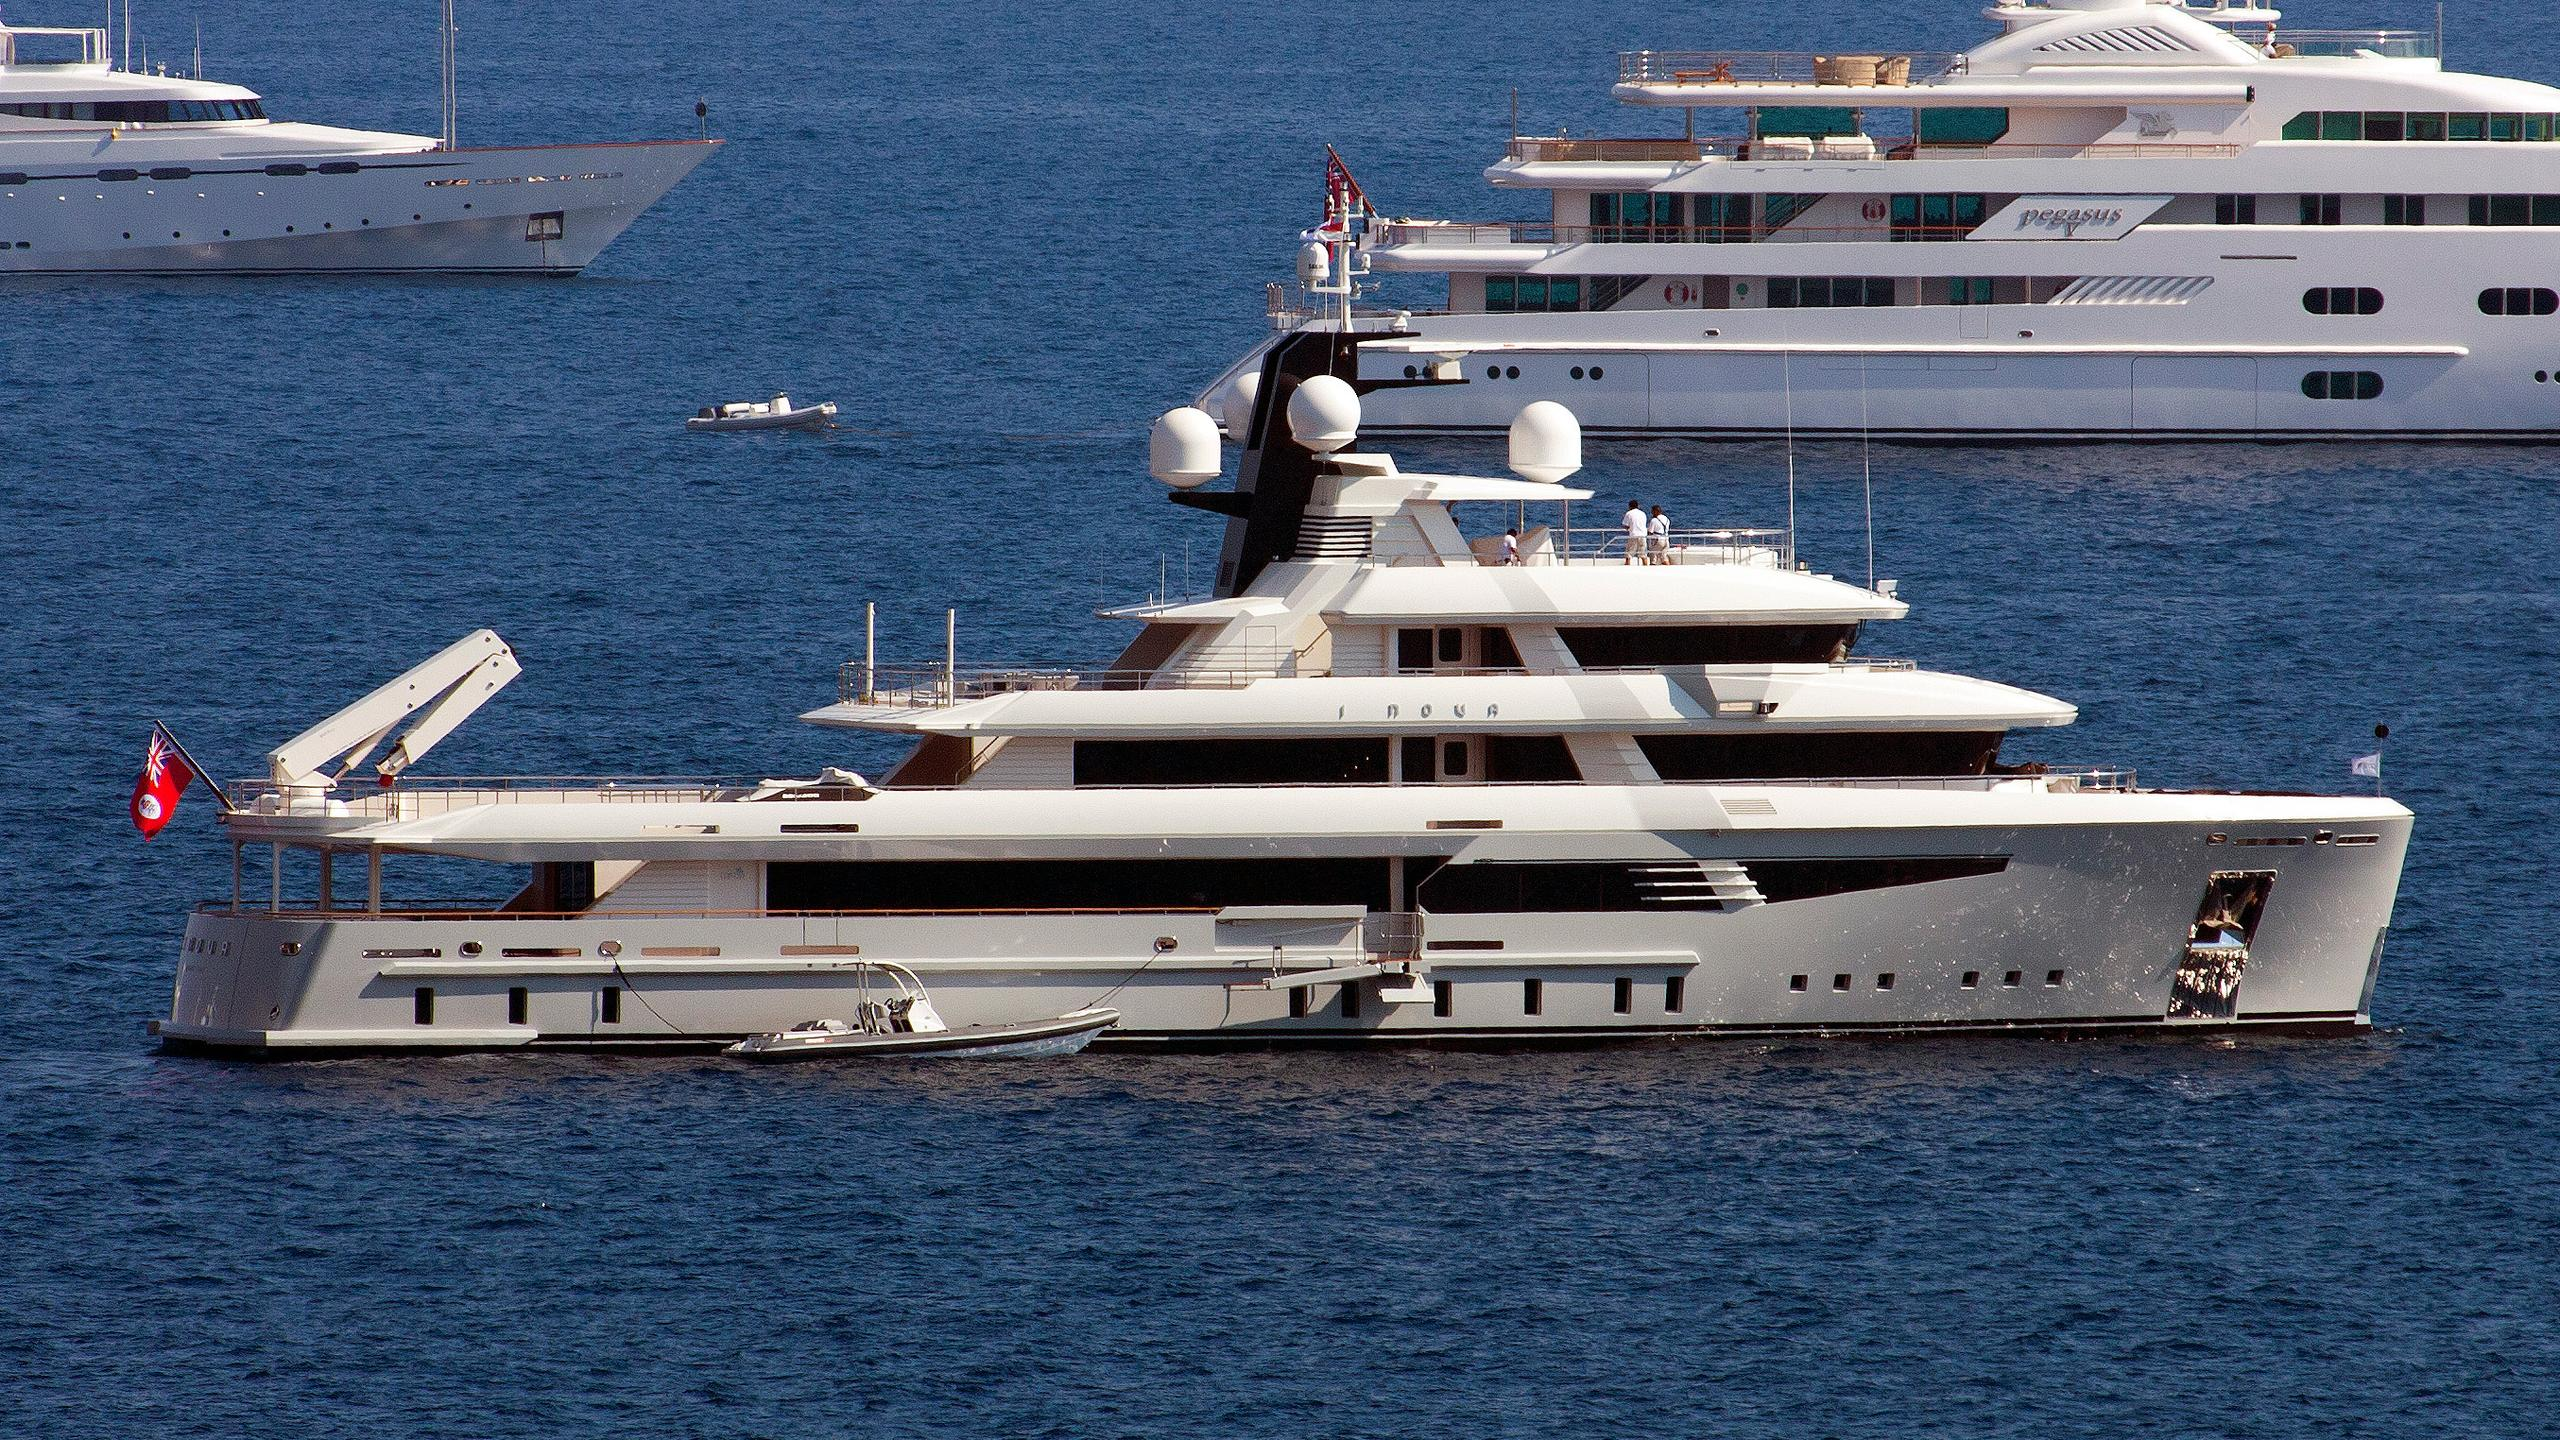 i-nova-explorer-yacht-cosmo-2013-50m-profile-moored